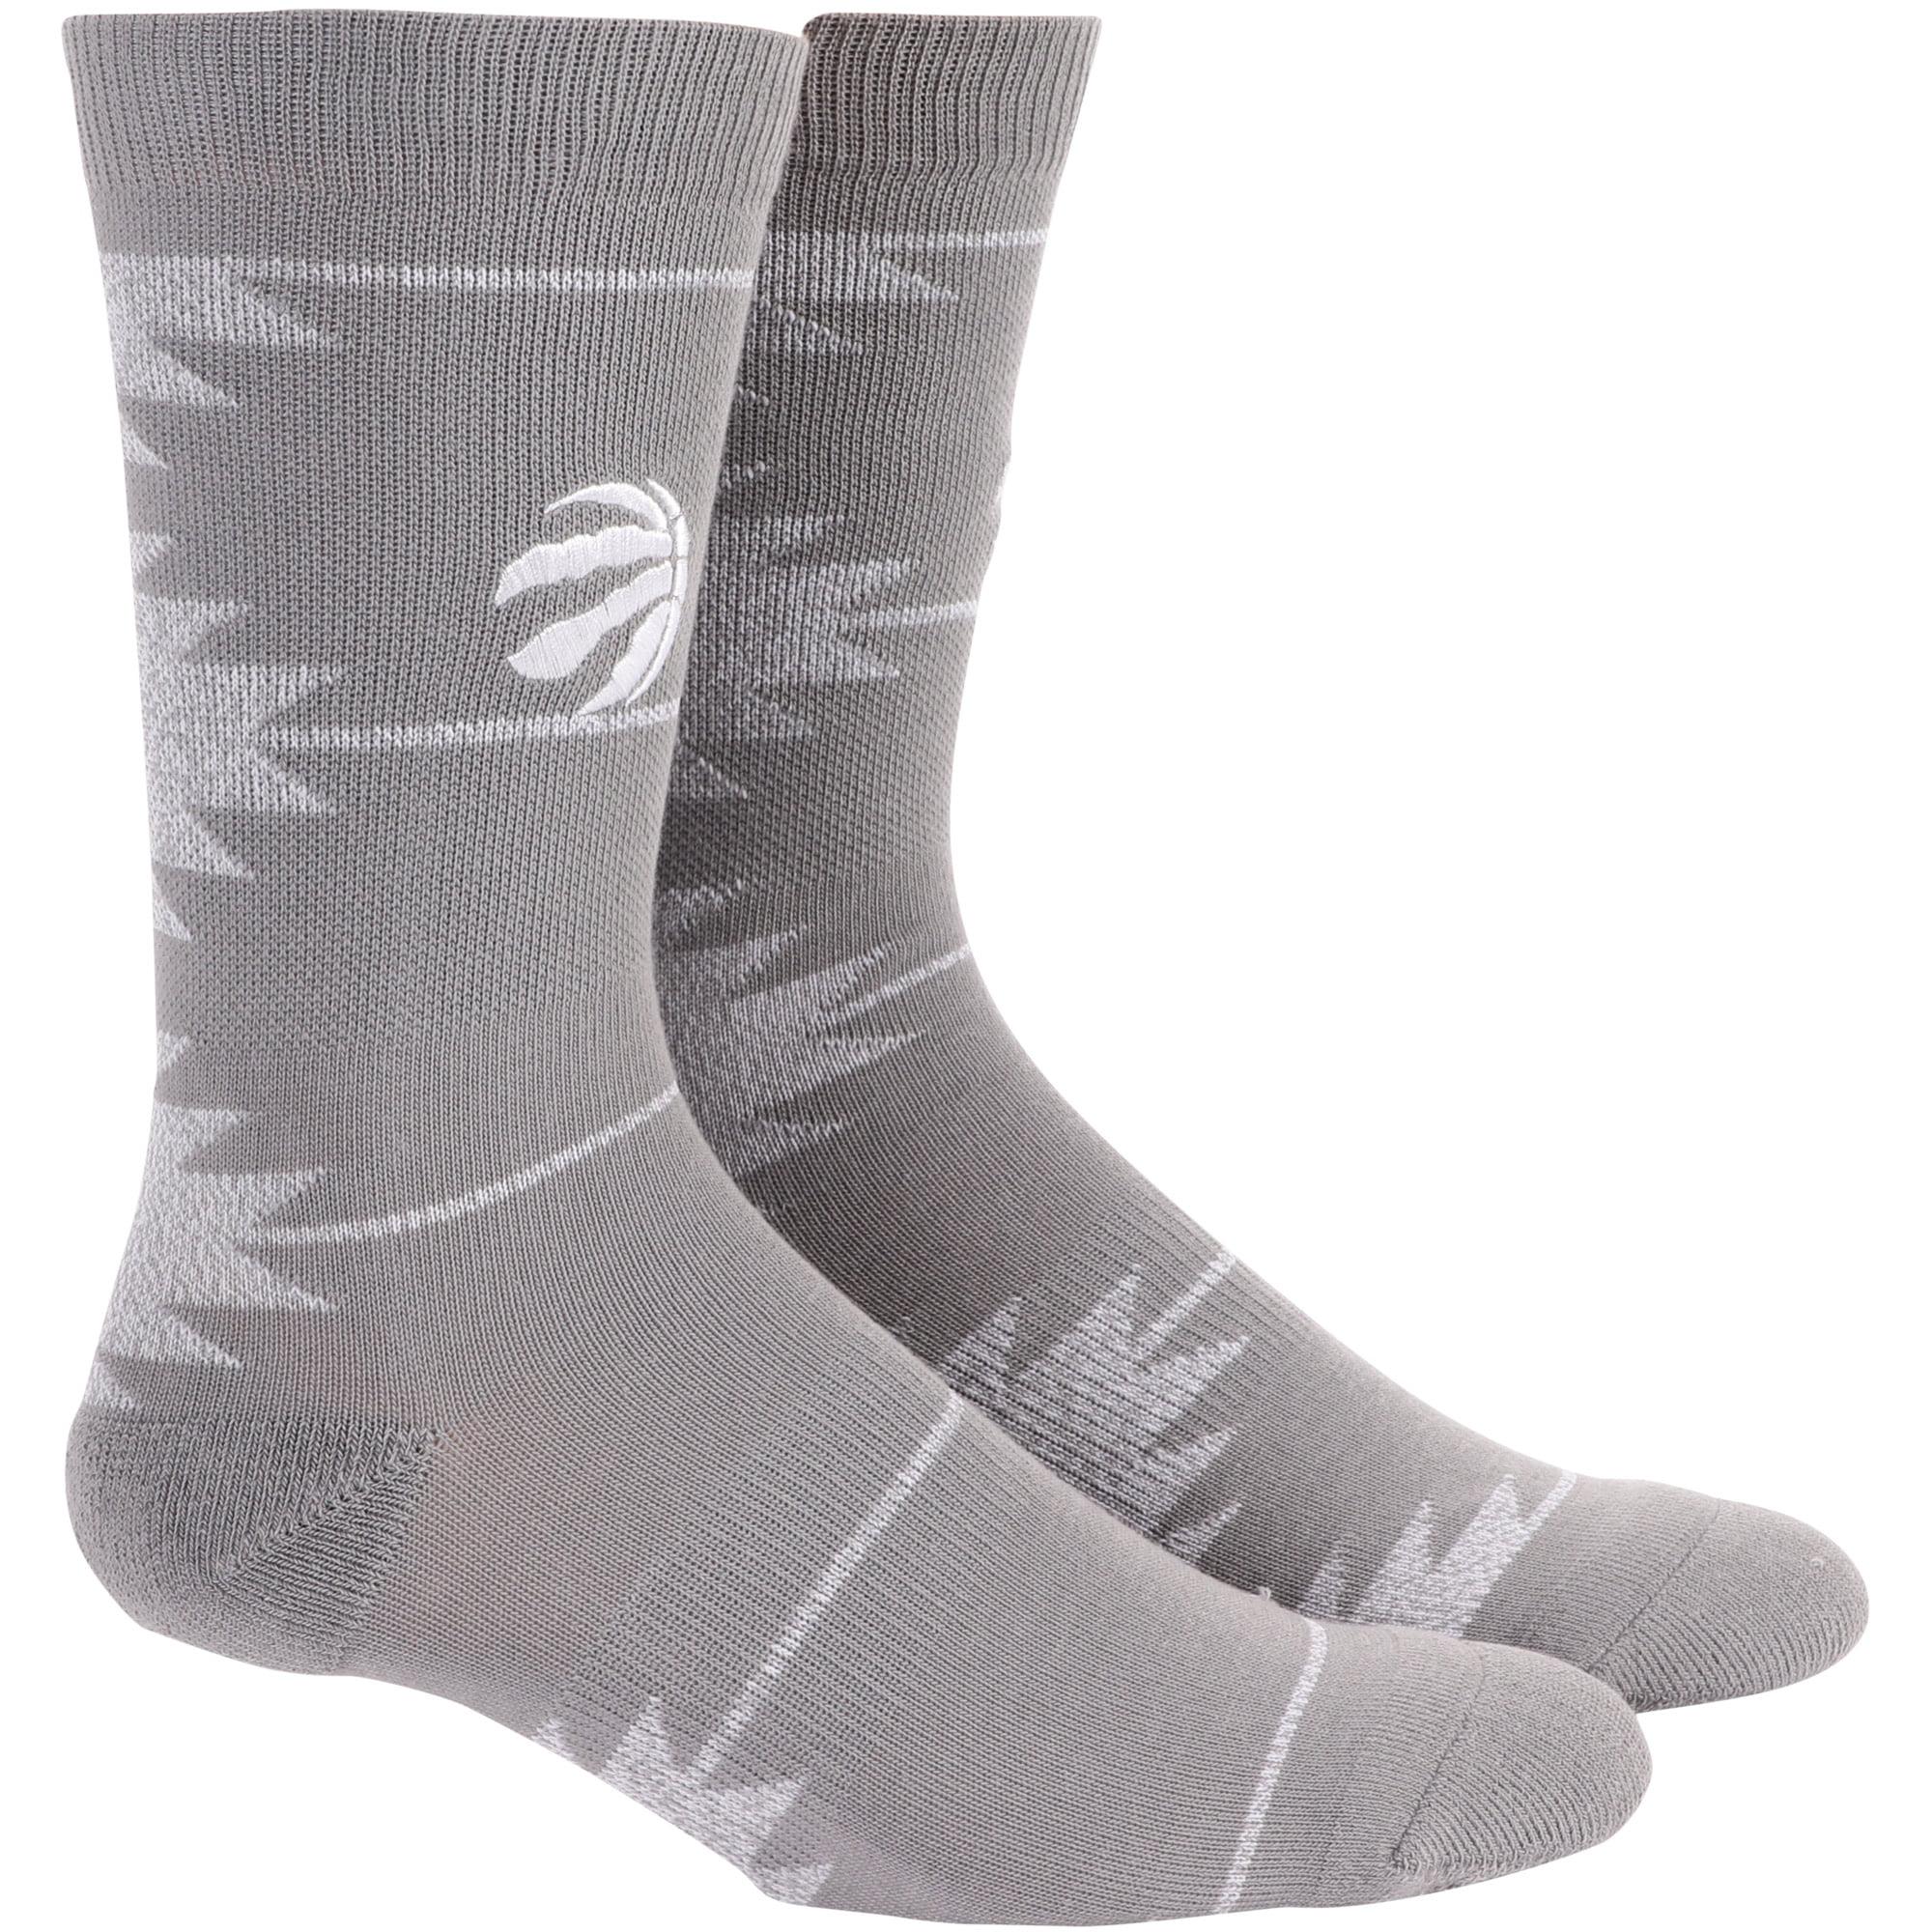 Toronto Raptors Geo Crew Socks - L